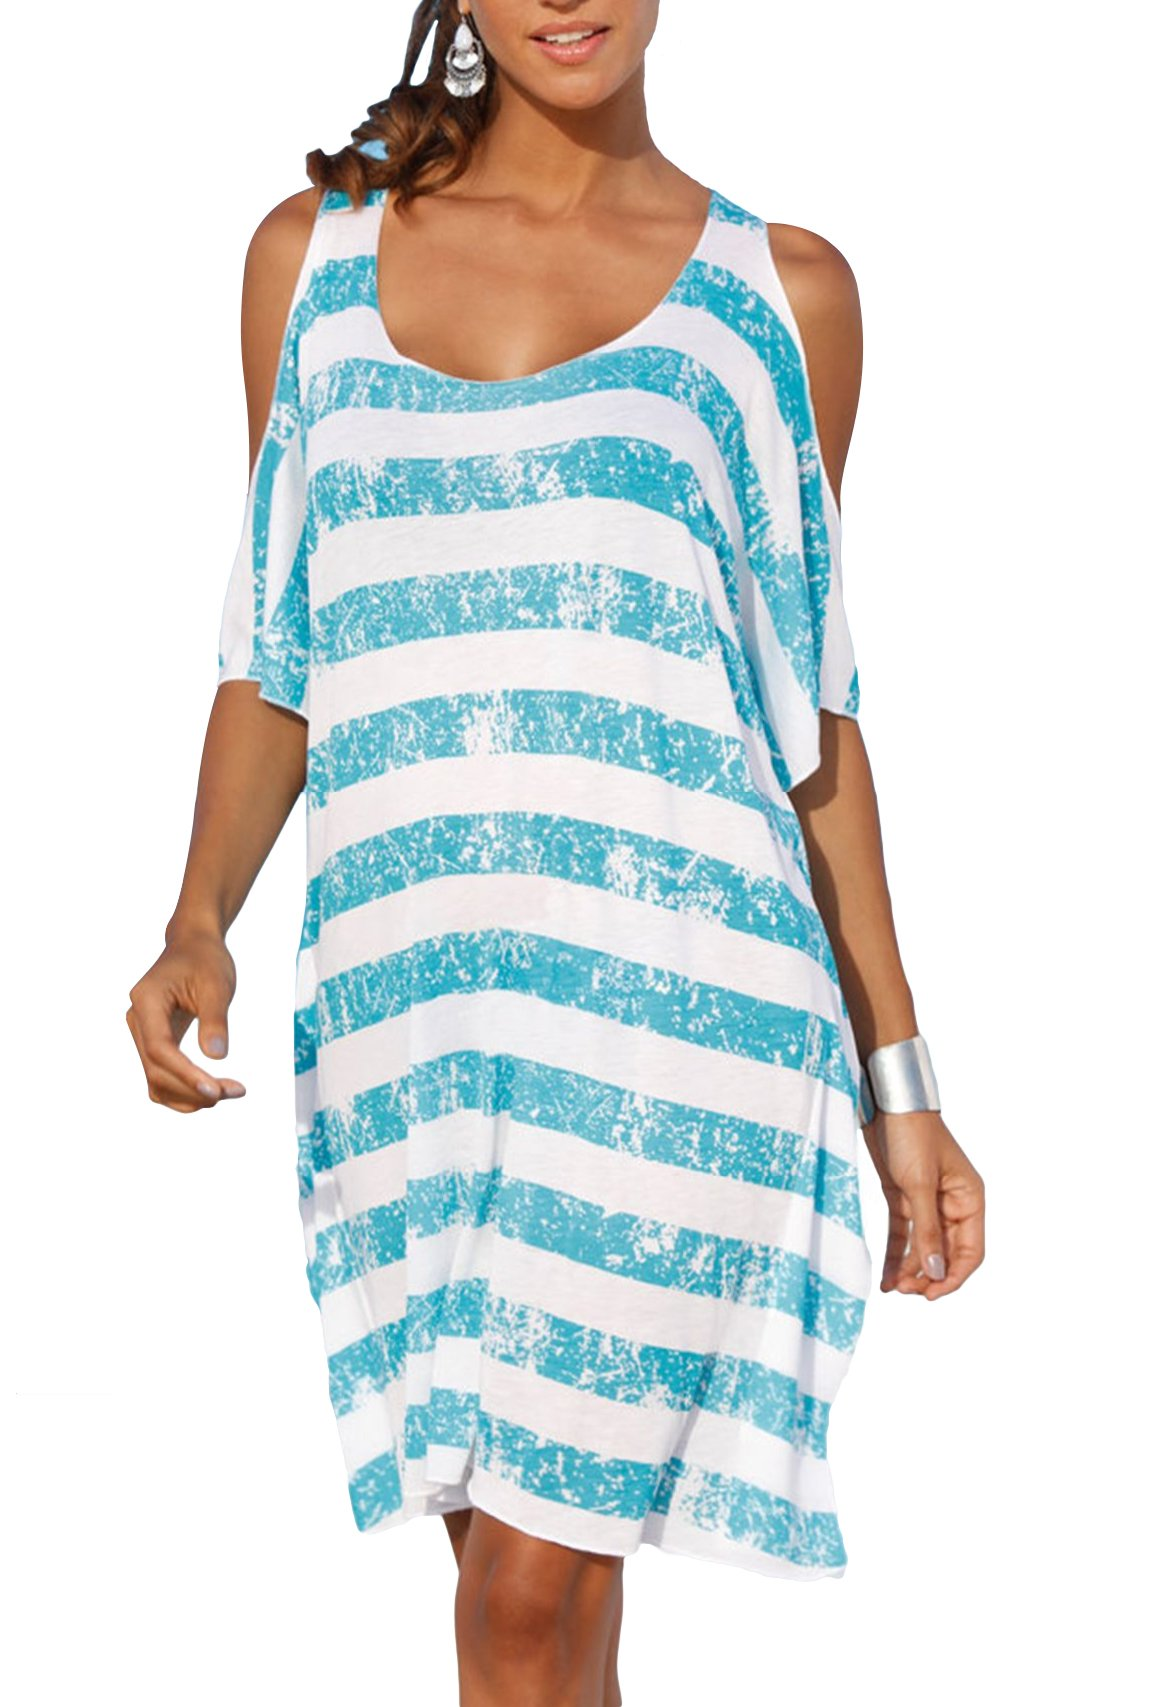 Upopby Women's Striped Loose Kaftan Bikini Swimsuit Beach Cover Up Dress Blue L